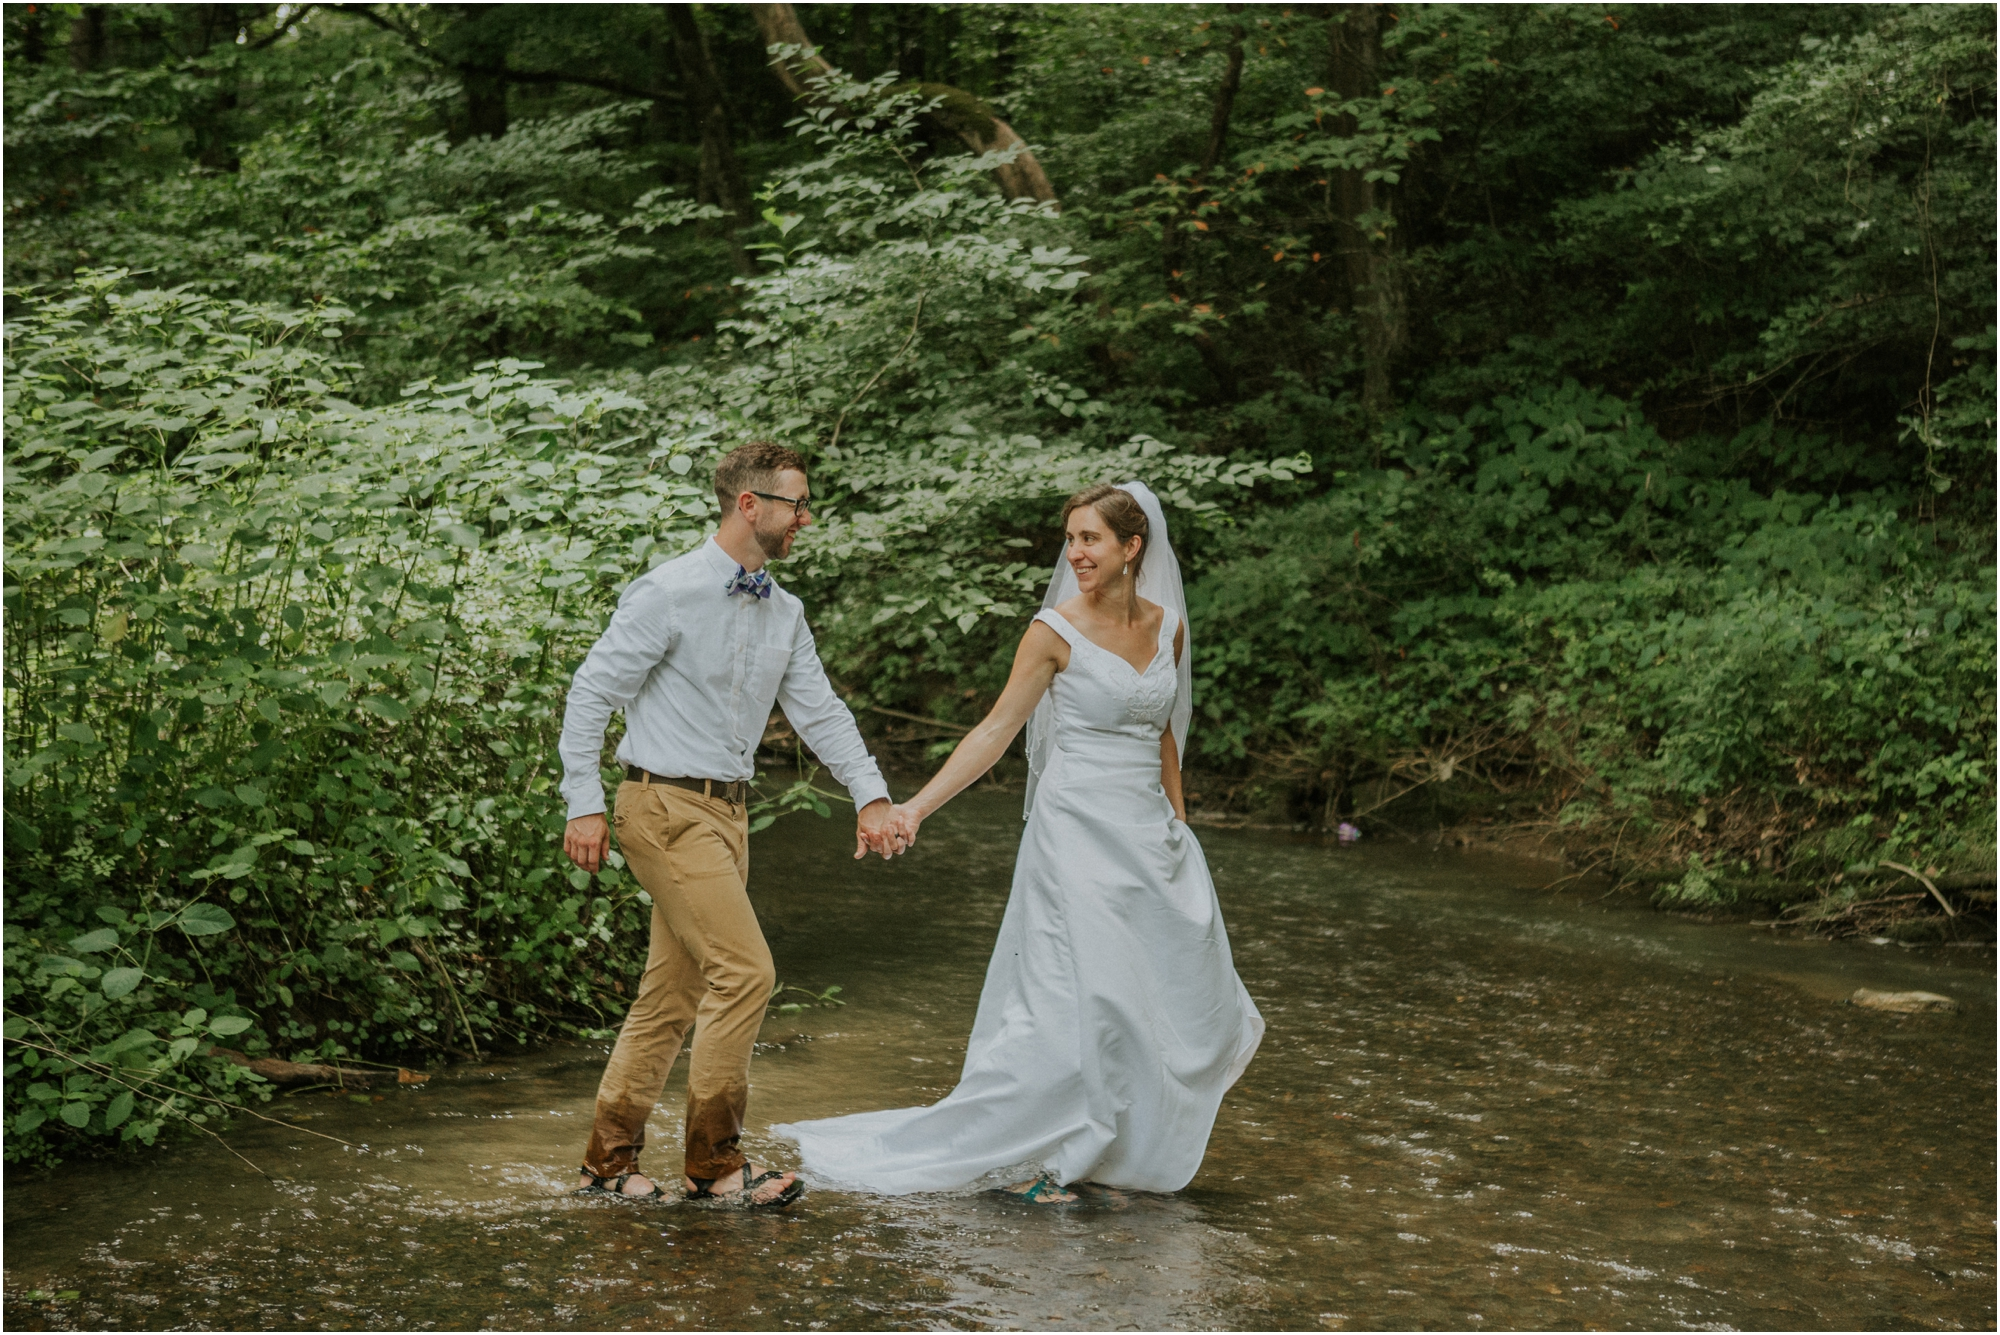 sugar-hollow-park-bristol-virginia-wedding-intimate-woodsy-black-forest-ceremony-adventurous-couple_0087.jpg